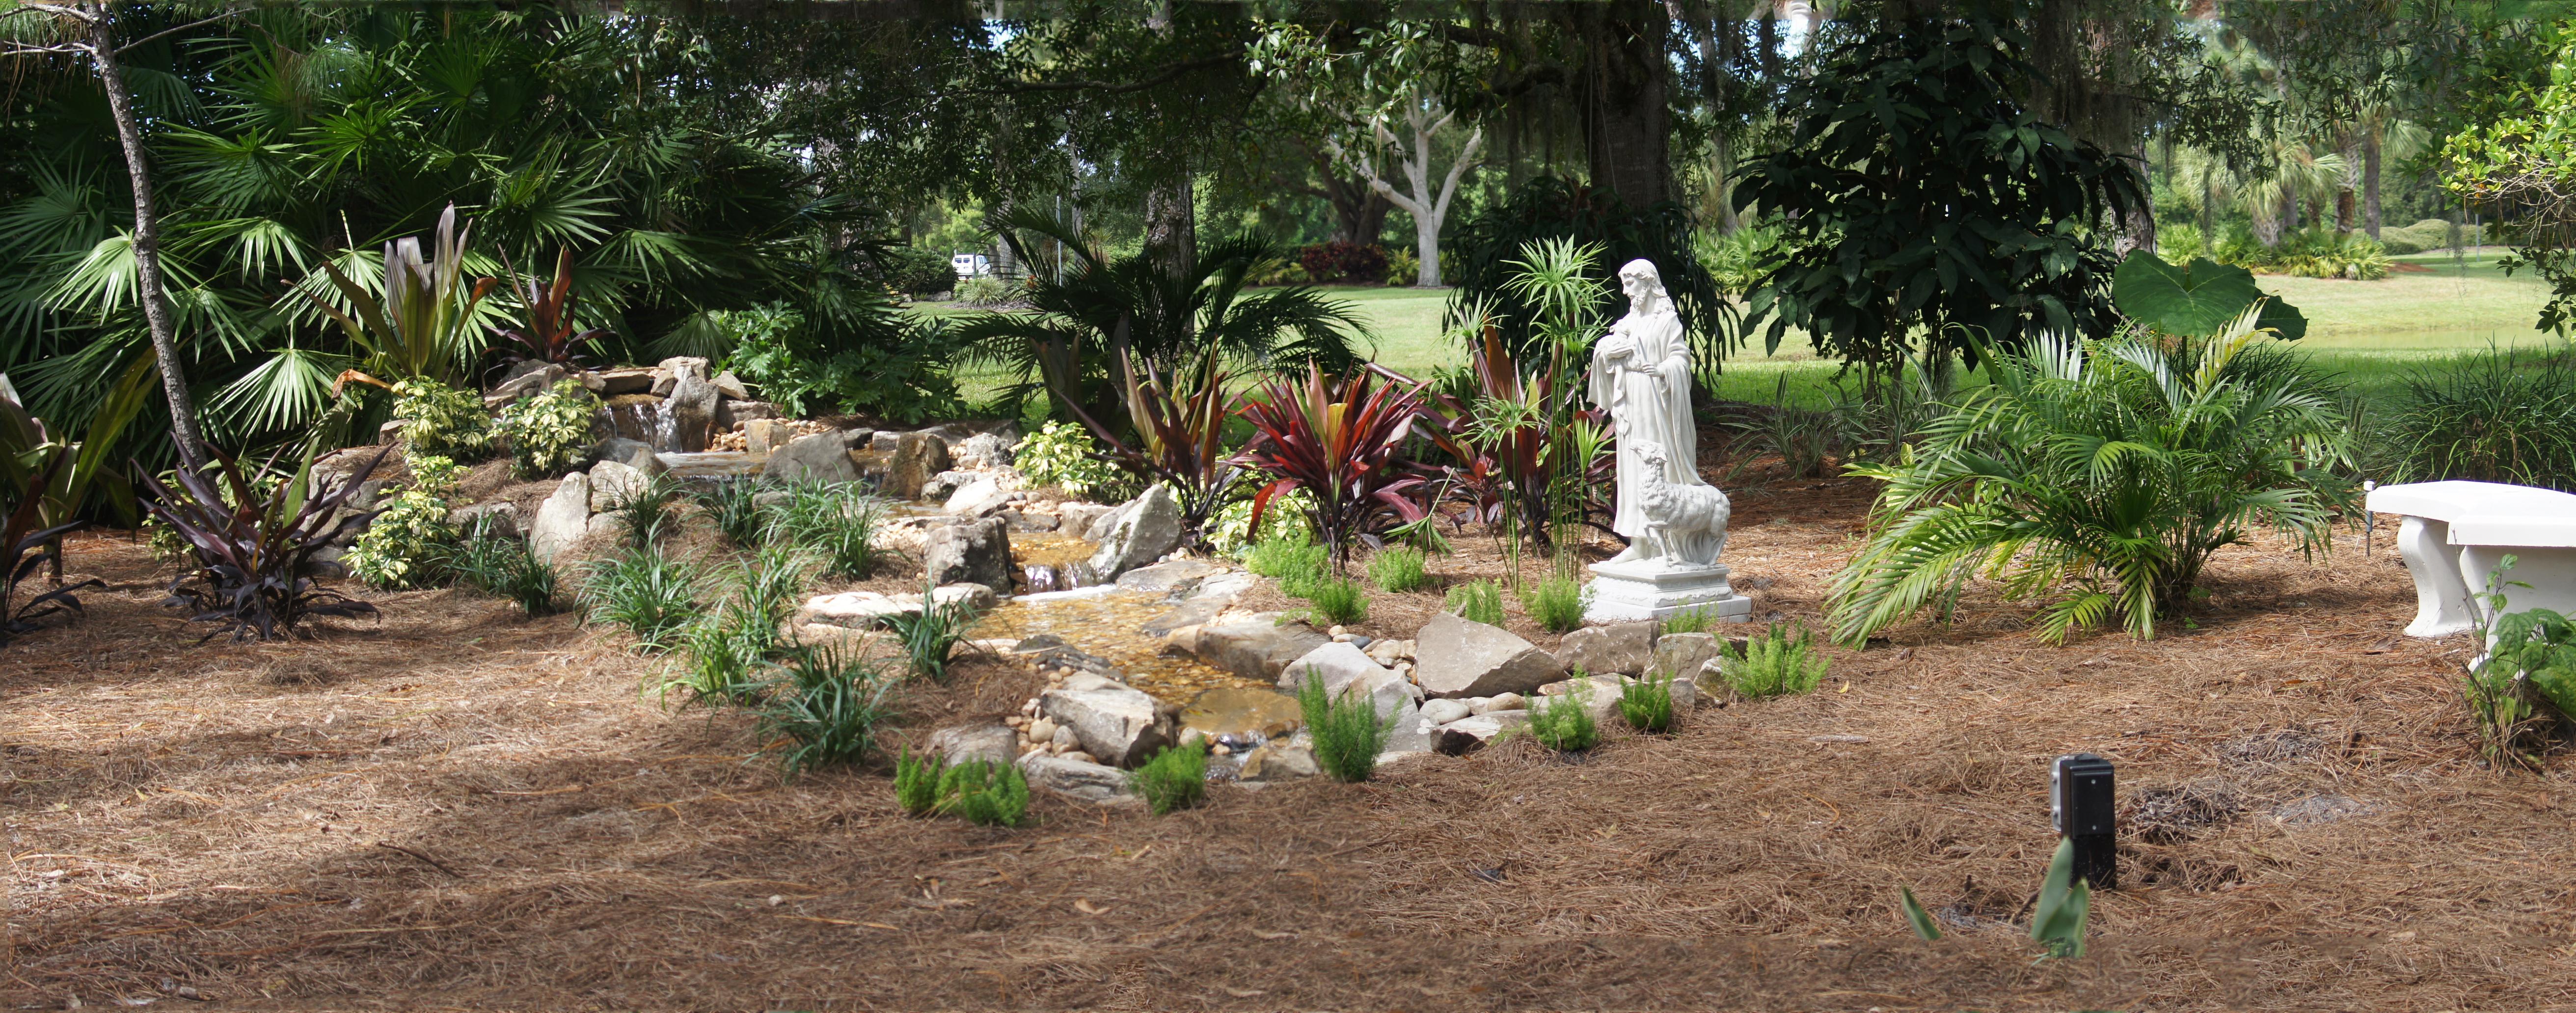 Good Shepherd Episcopal Venice FL Our Memorial Gardens